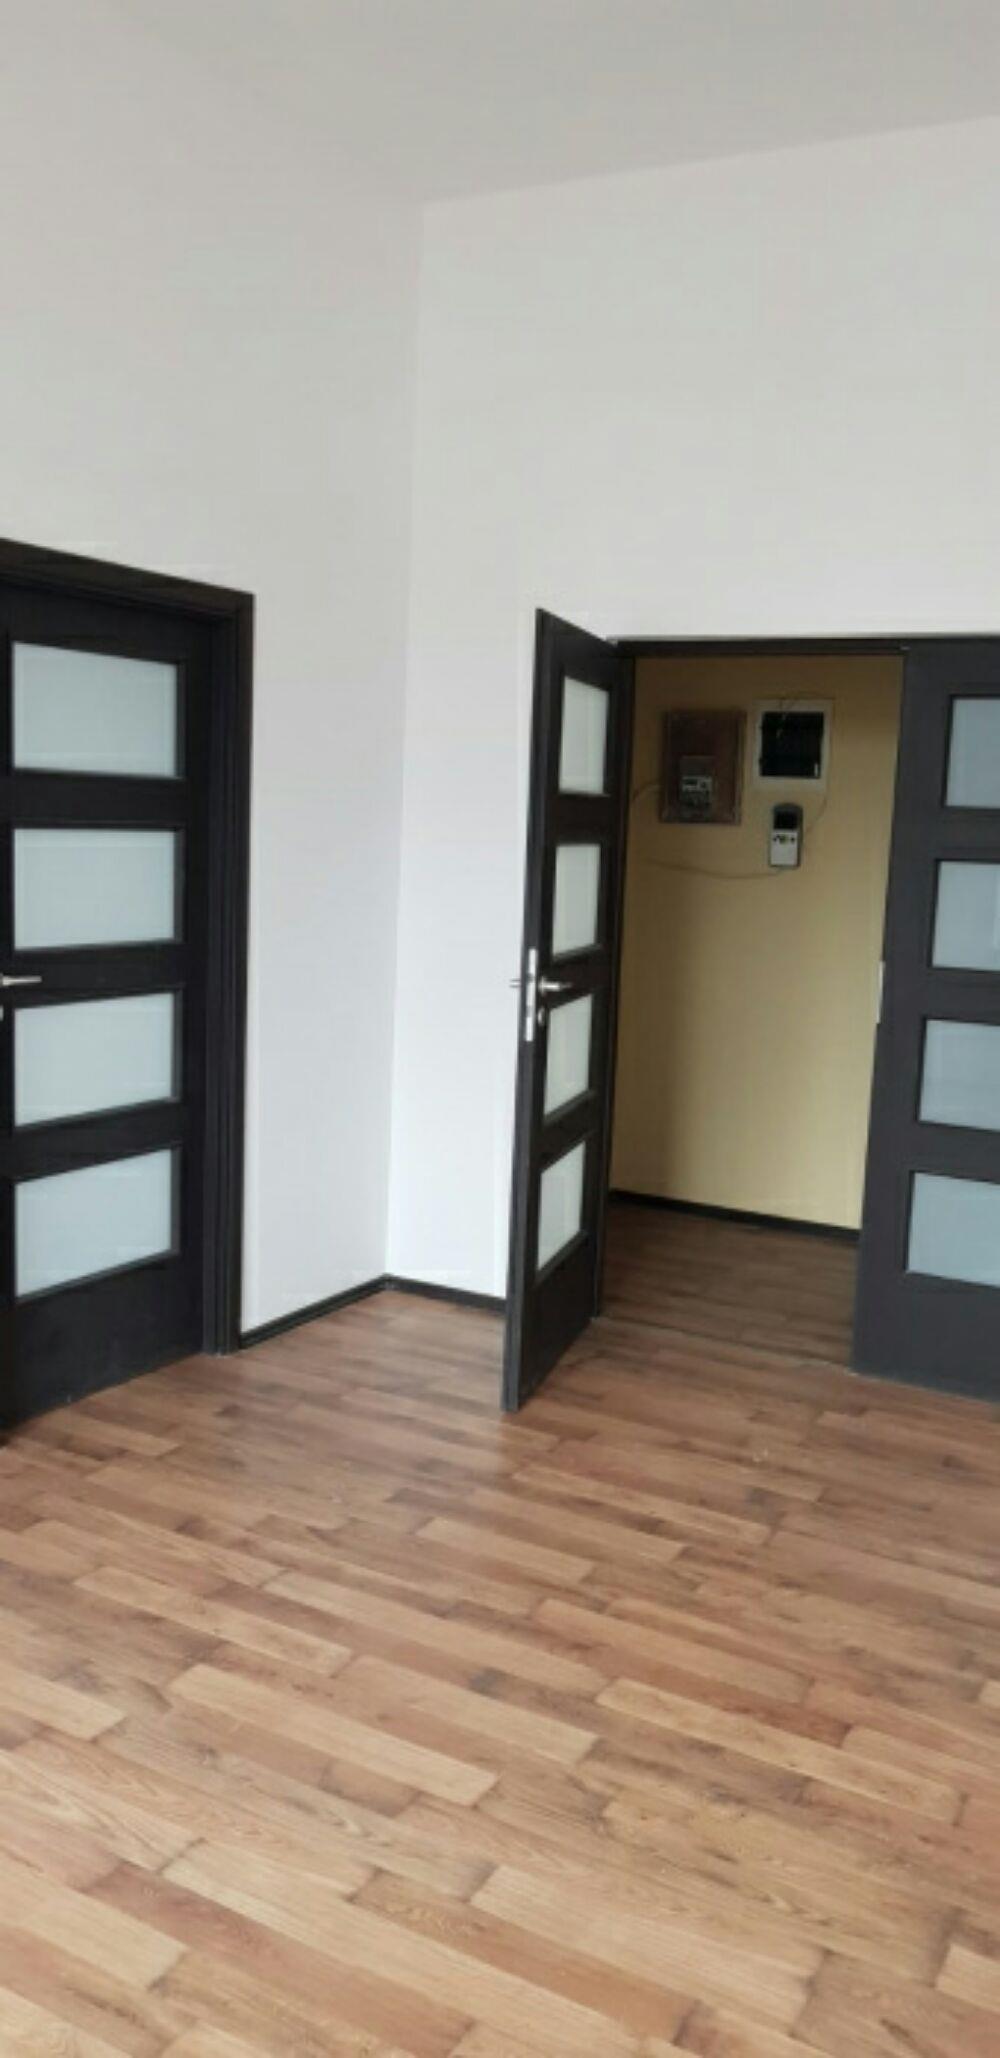 Apartament de închiriat  - imagine 3